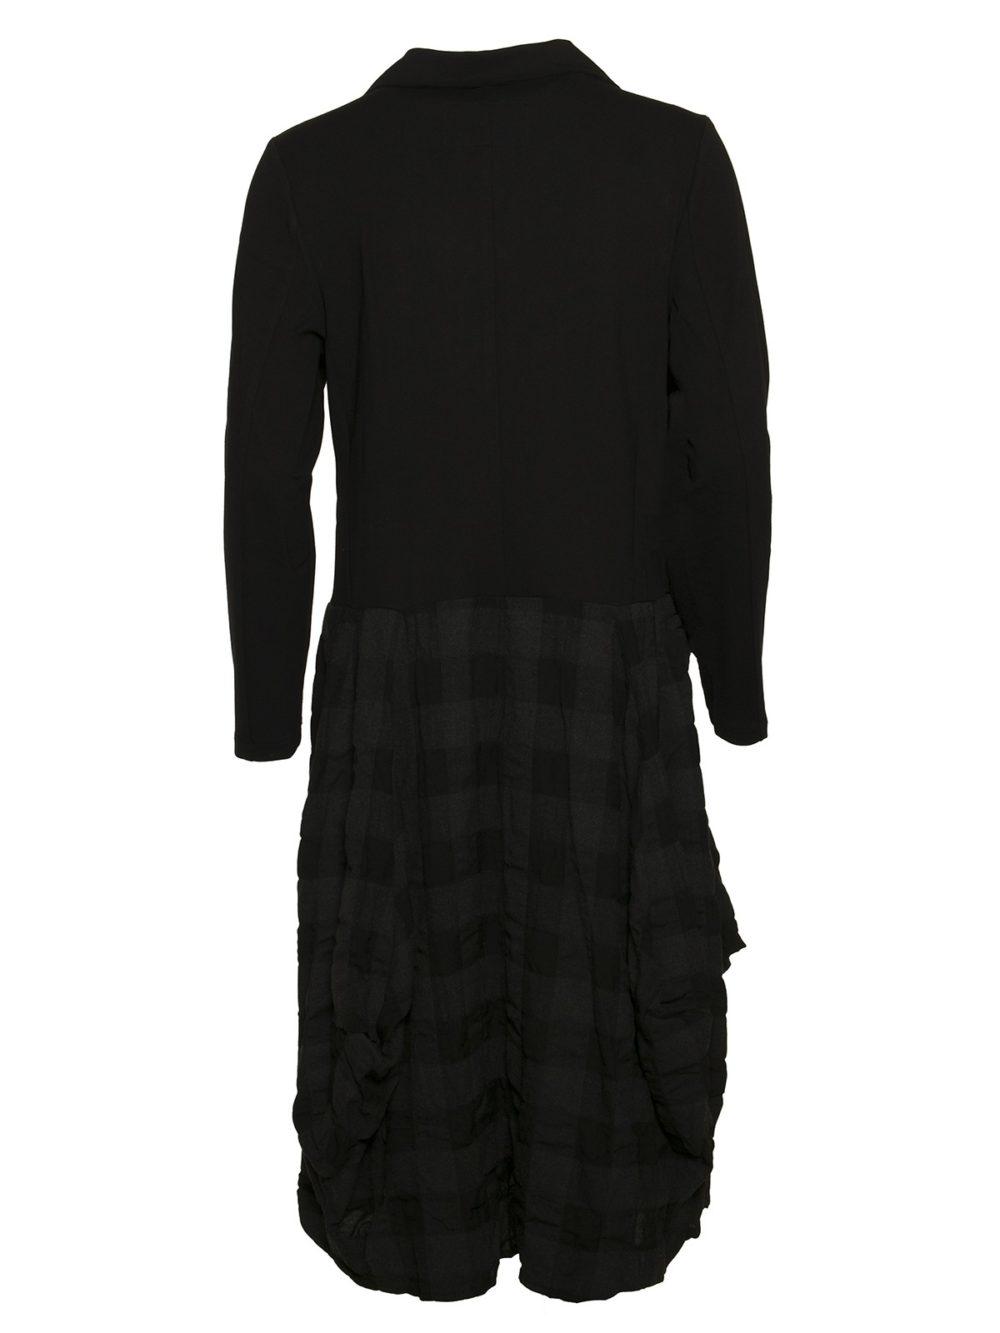 Fuku Jacket Kokomarina Katie Kerr Women's Clothing